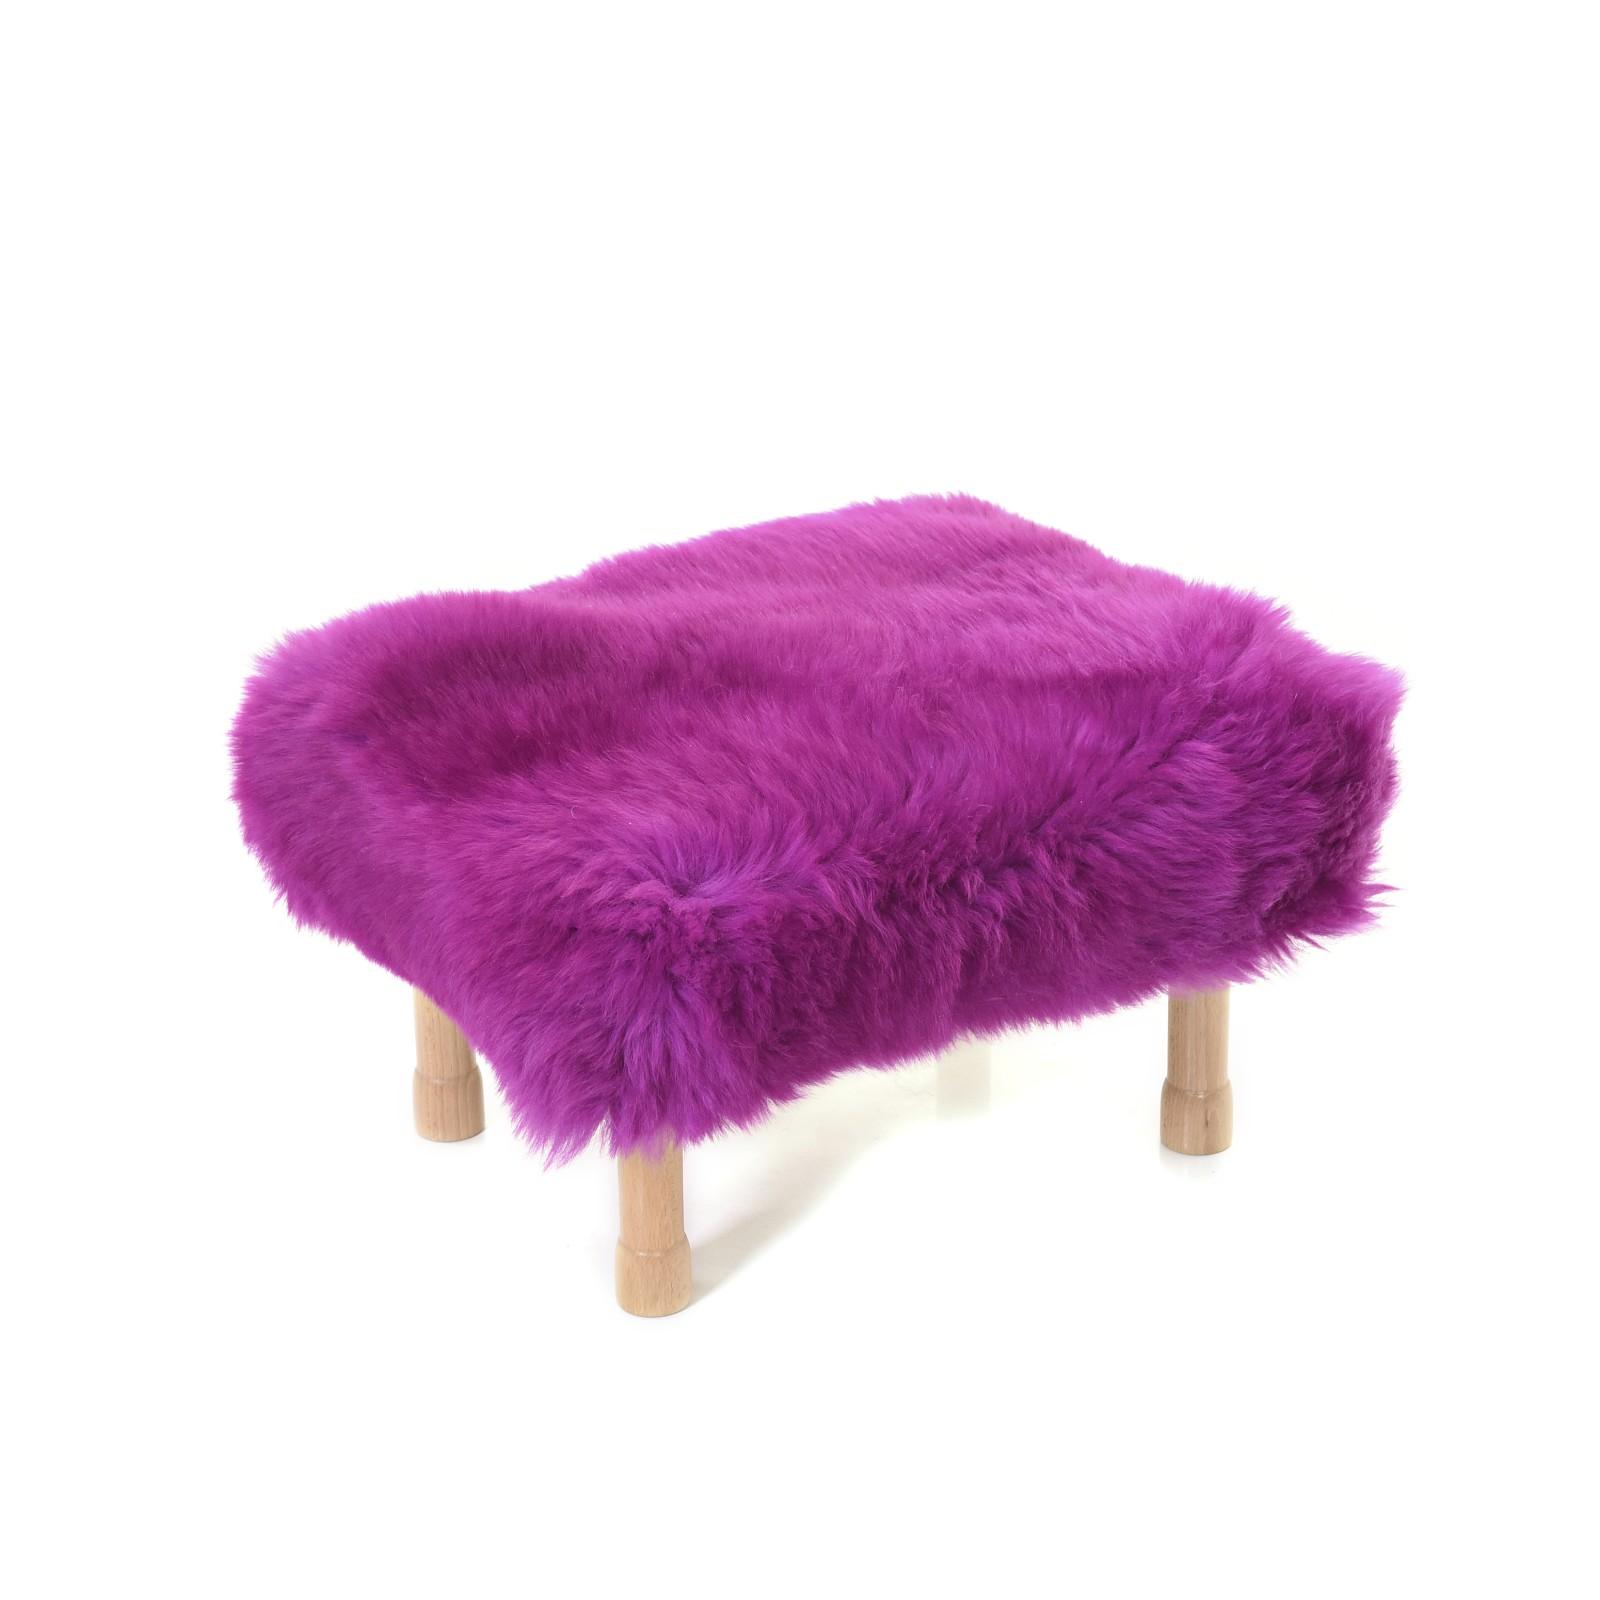 Dilys - Sheepskin Footstool Cerise